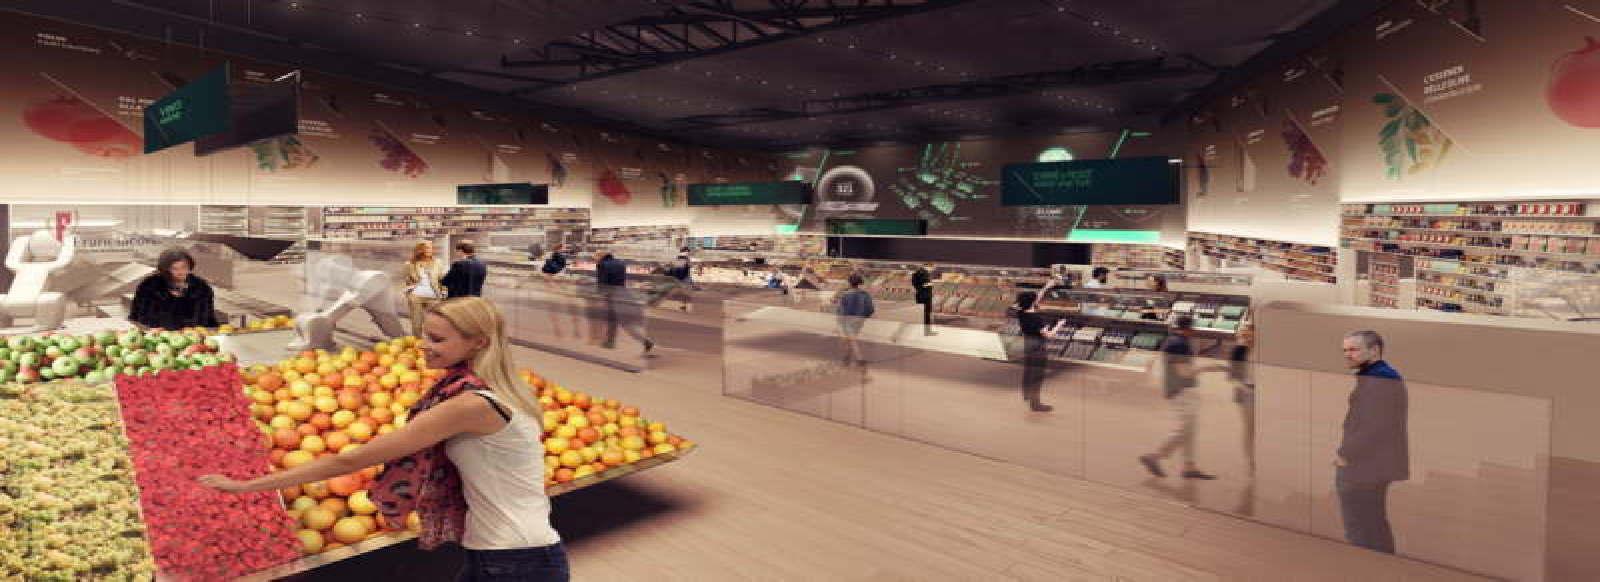 SpazioFMG Futurecraft Tomorrow by Design #1